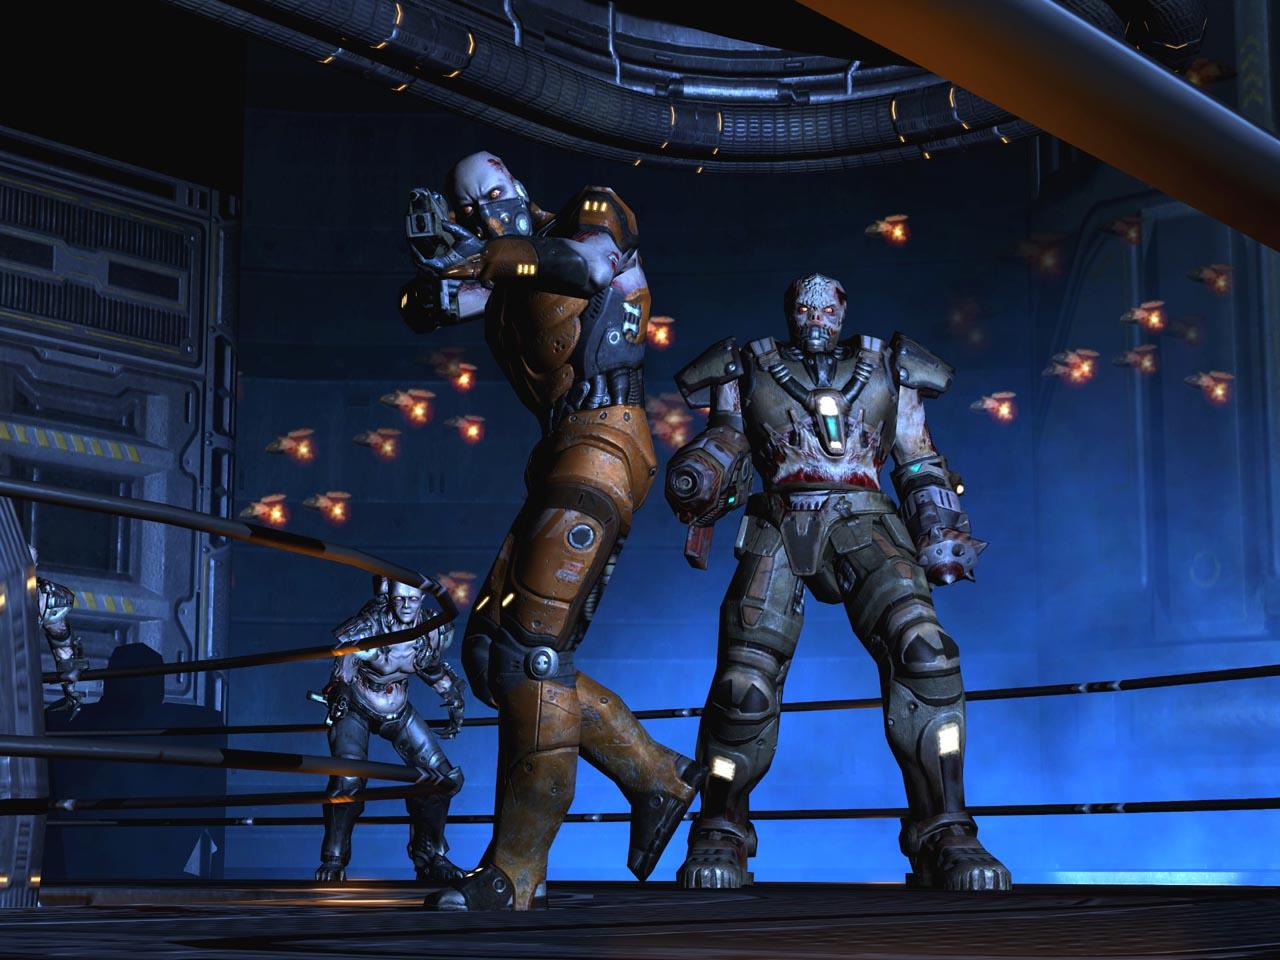 Quake 4 Screenshots - Video Game News, Videos, and File ... Quake 4 Monsters